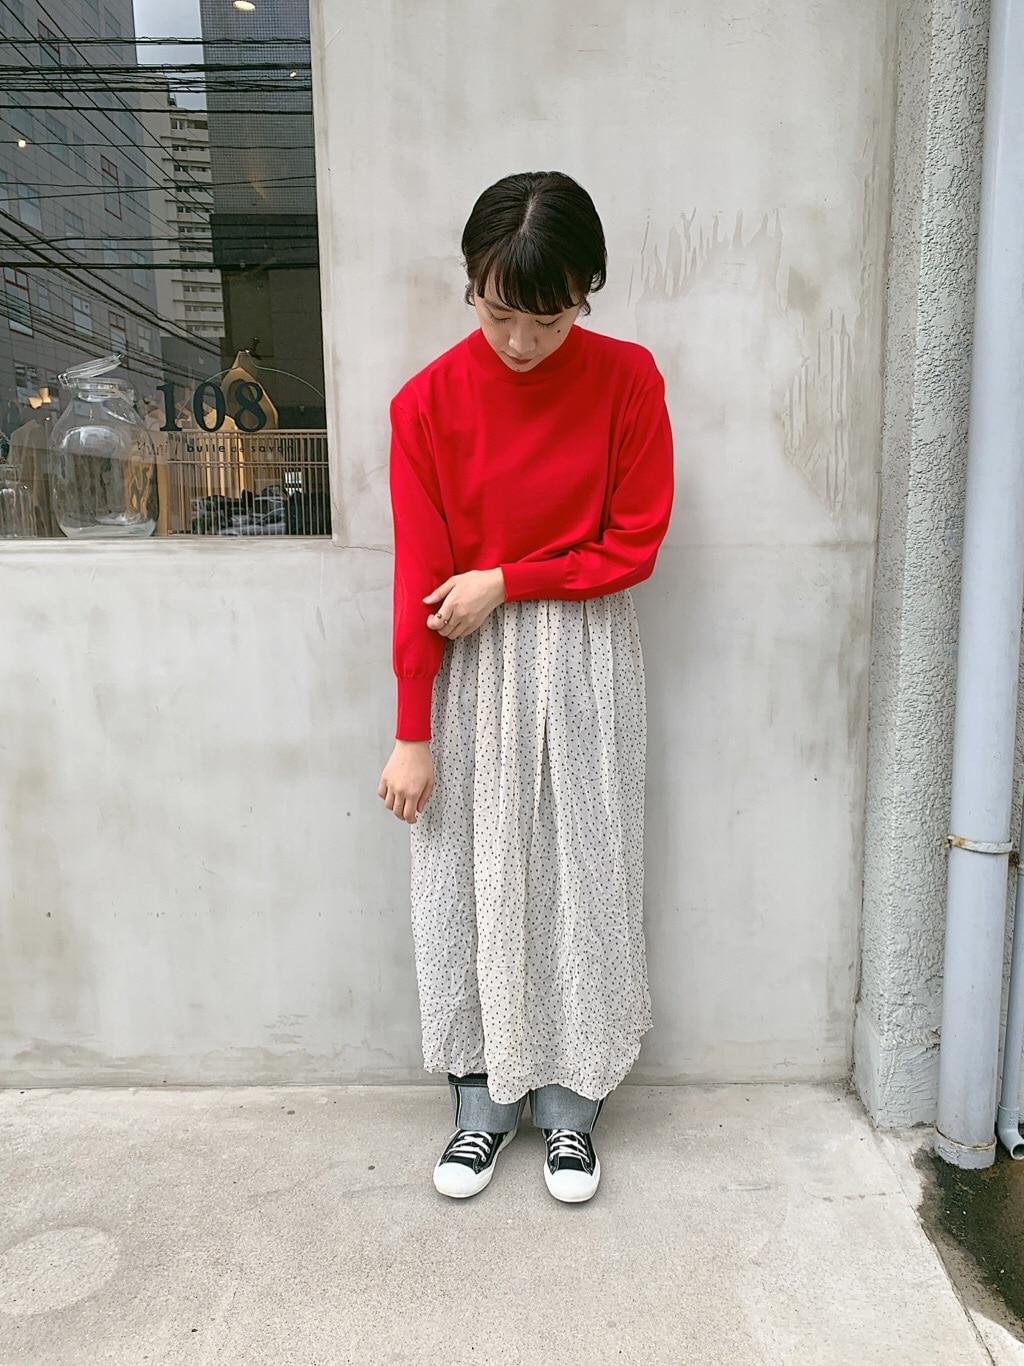 108 yuni / bulle de savon 福岡薬院路面 身長:158cm 2019.09.03